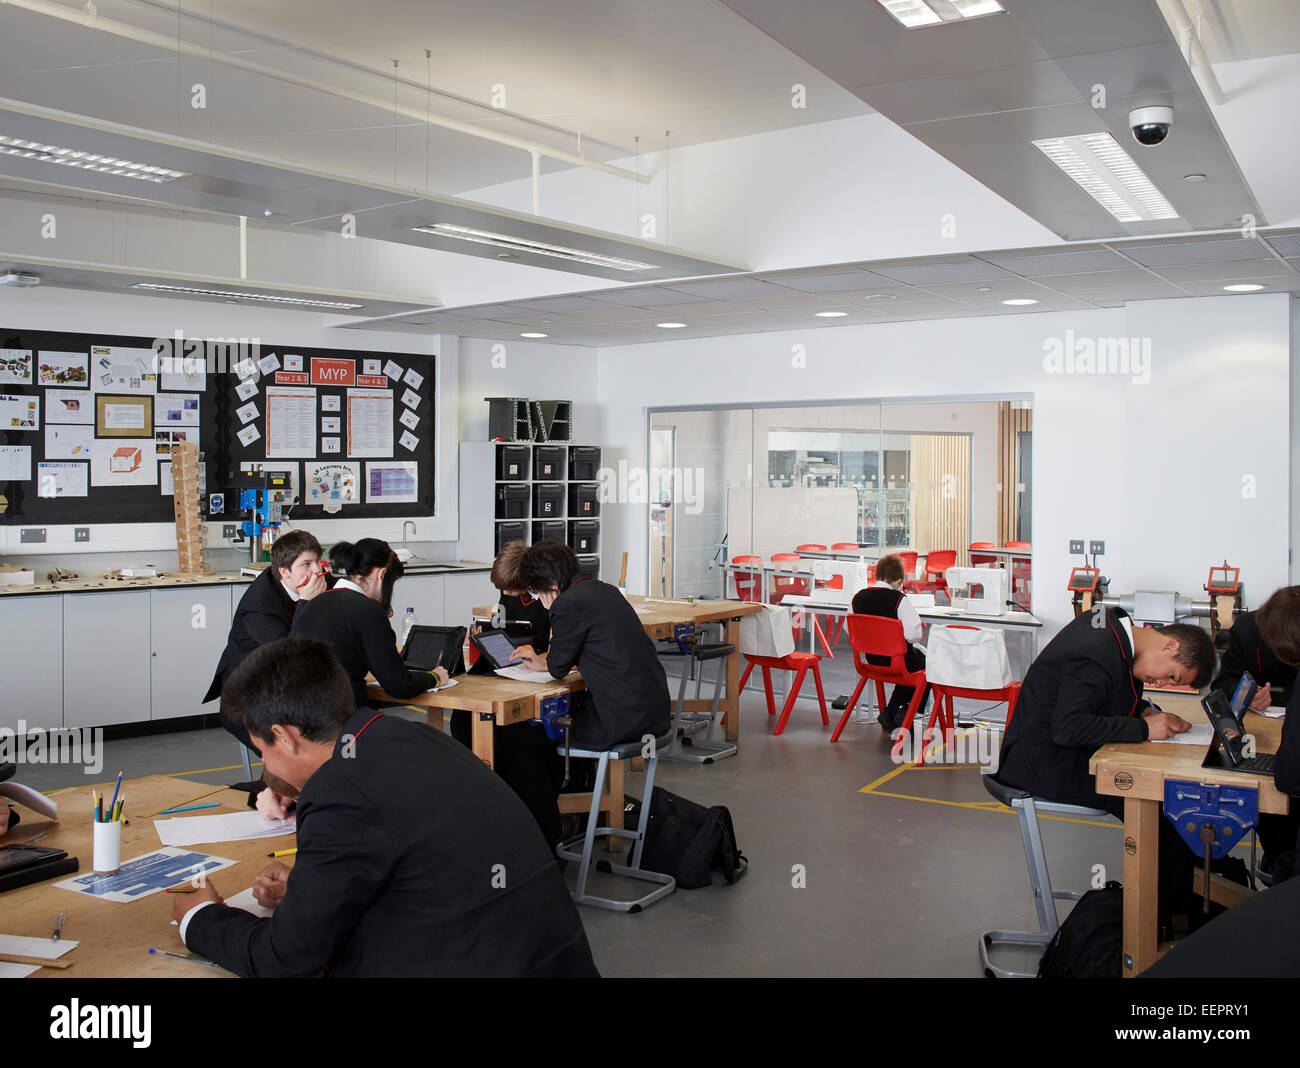 Skinners Academy Kent Royal Tunbridge Wells United Kingdom Architect Hunters South